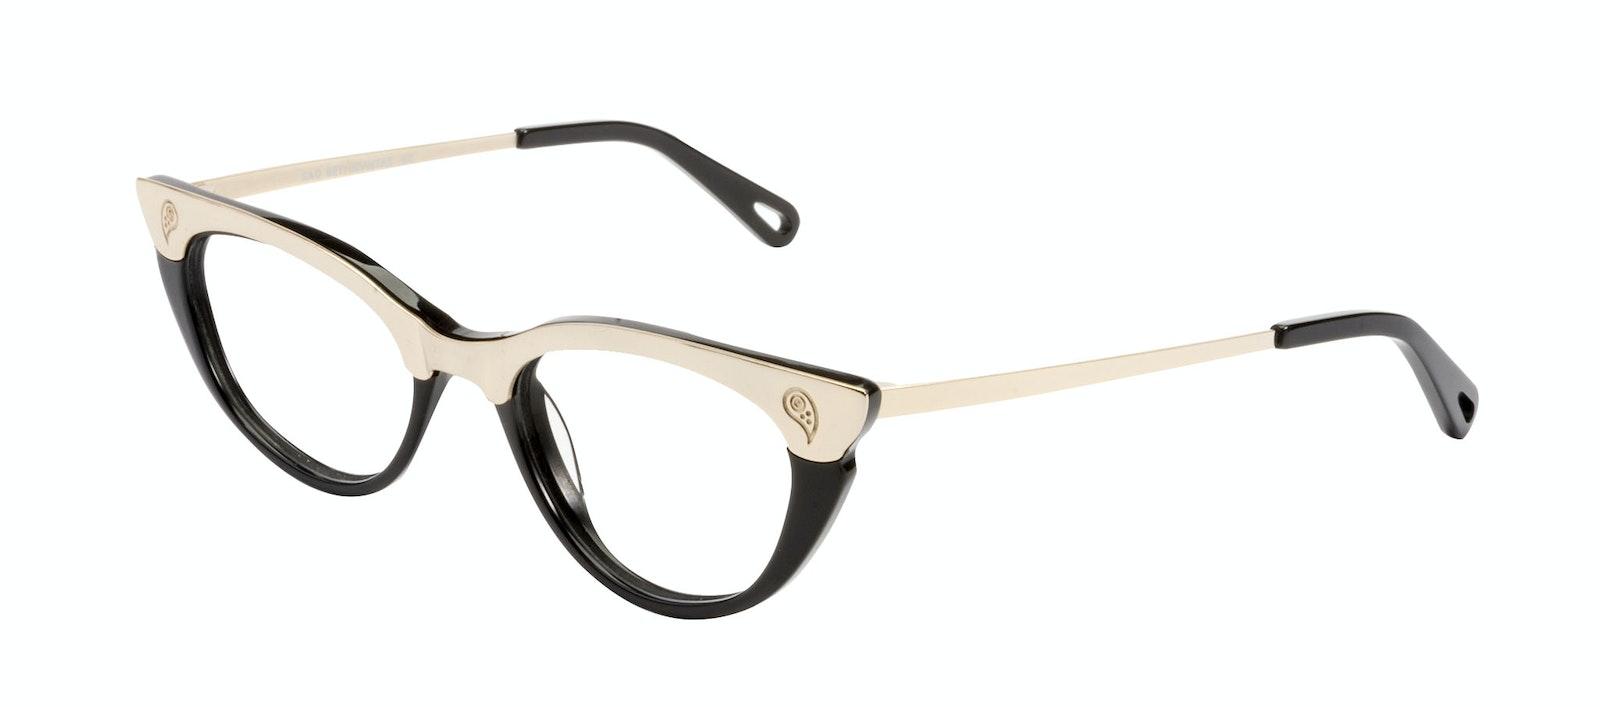 Affordable Fashion Glasses Cat Eye Daring Cateye Eyeglasses Women Bad Beti Mumtaz Tilt